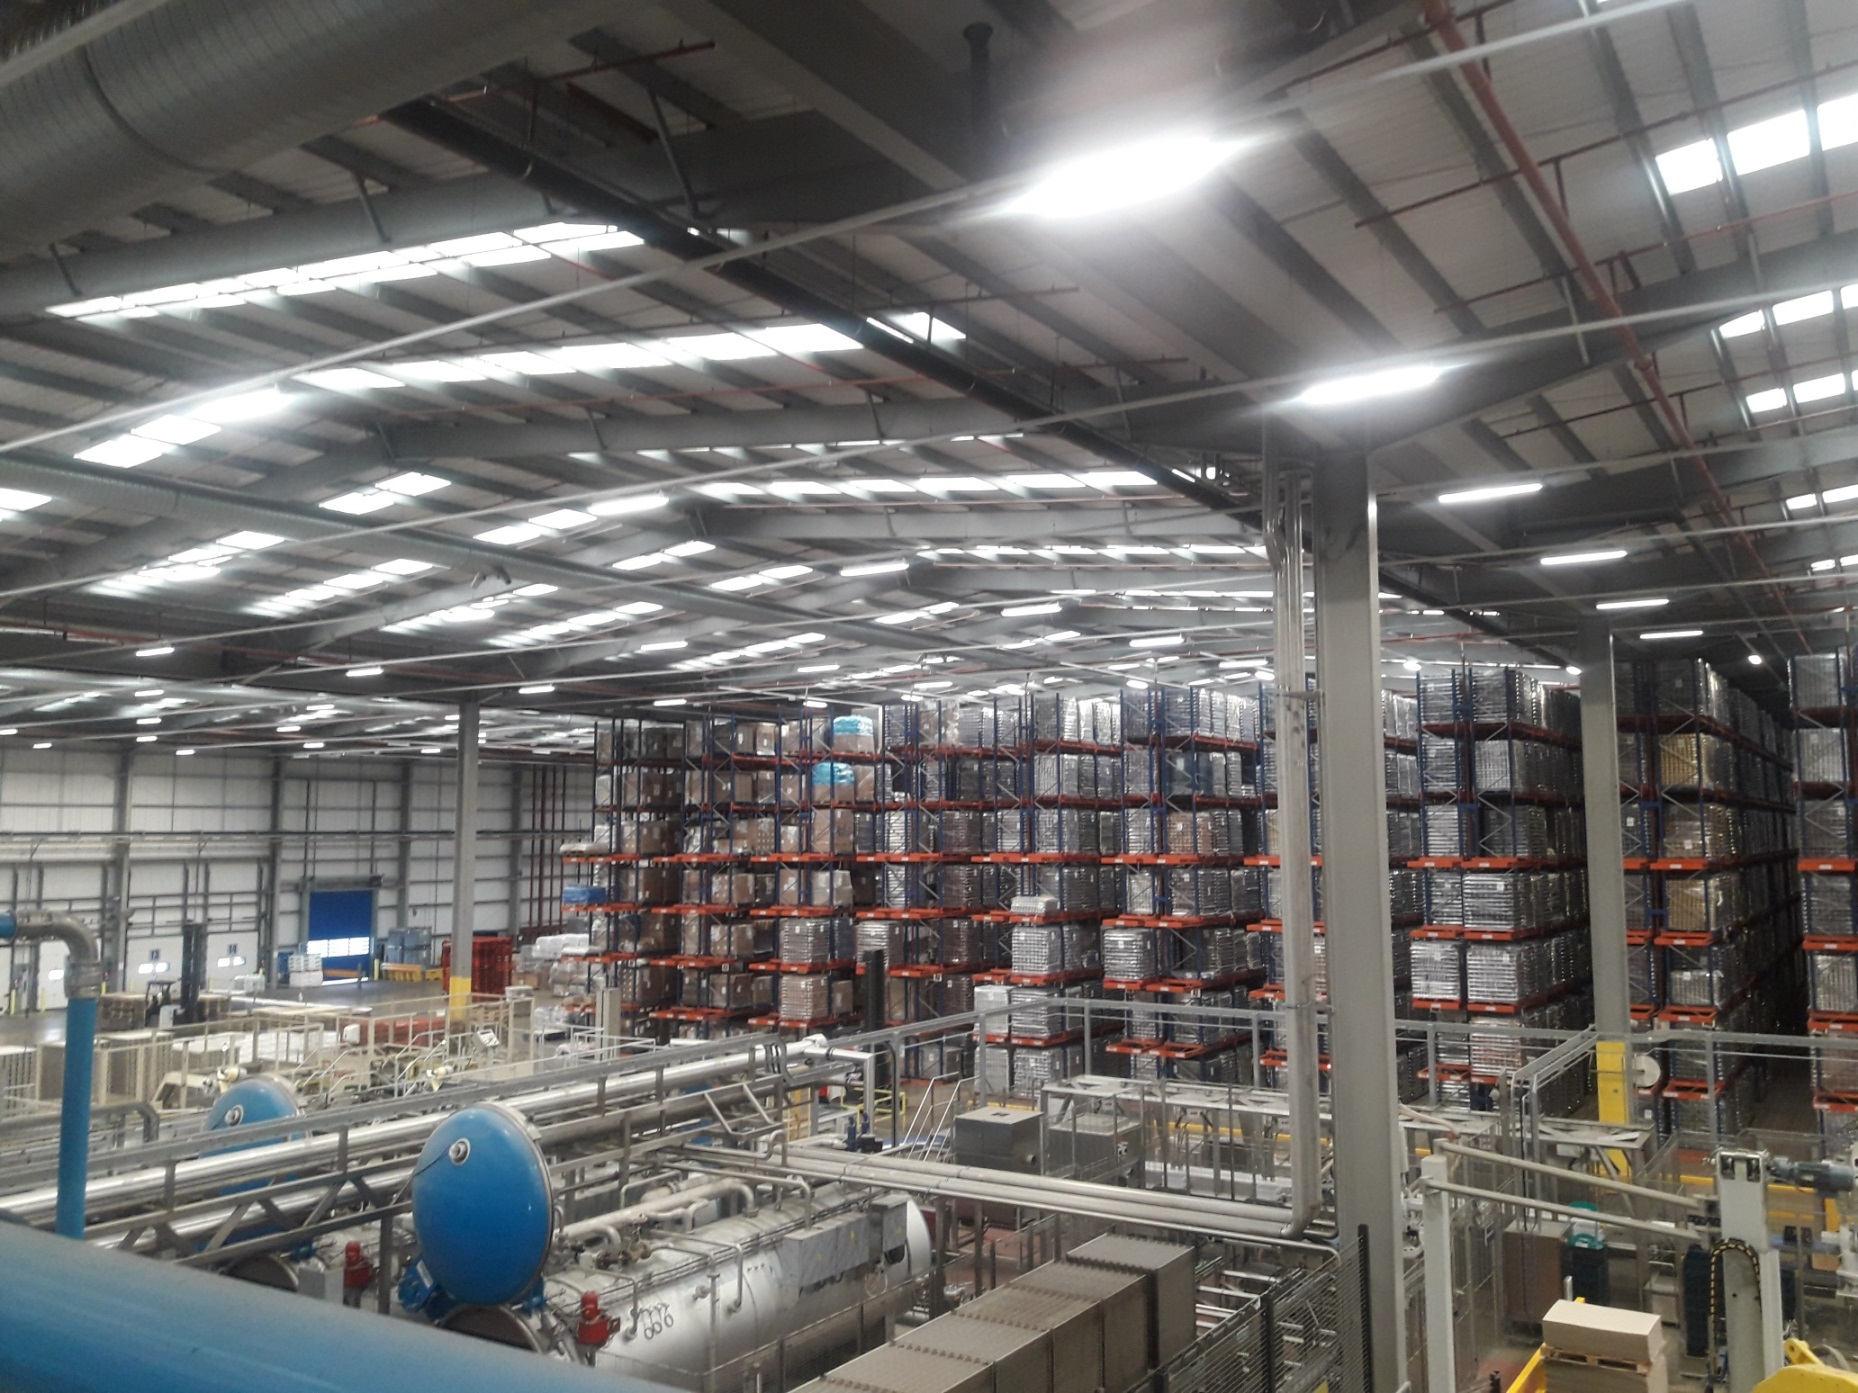 Ecolighting warehouse